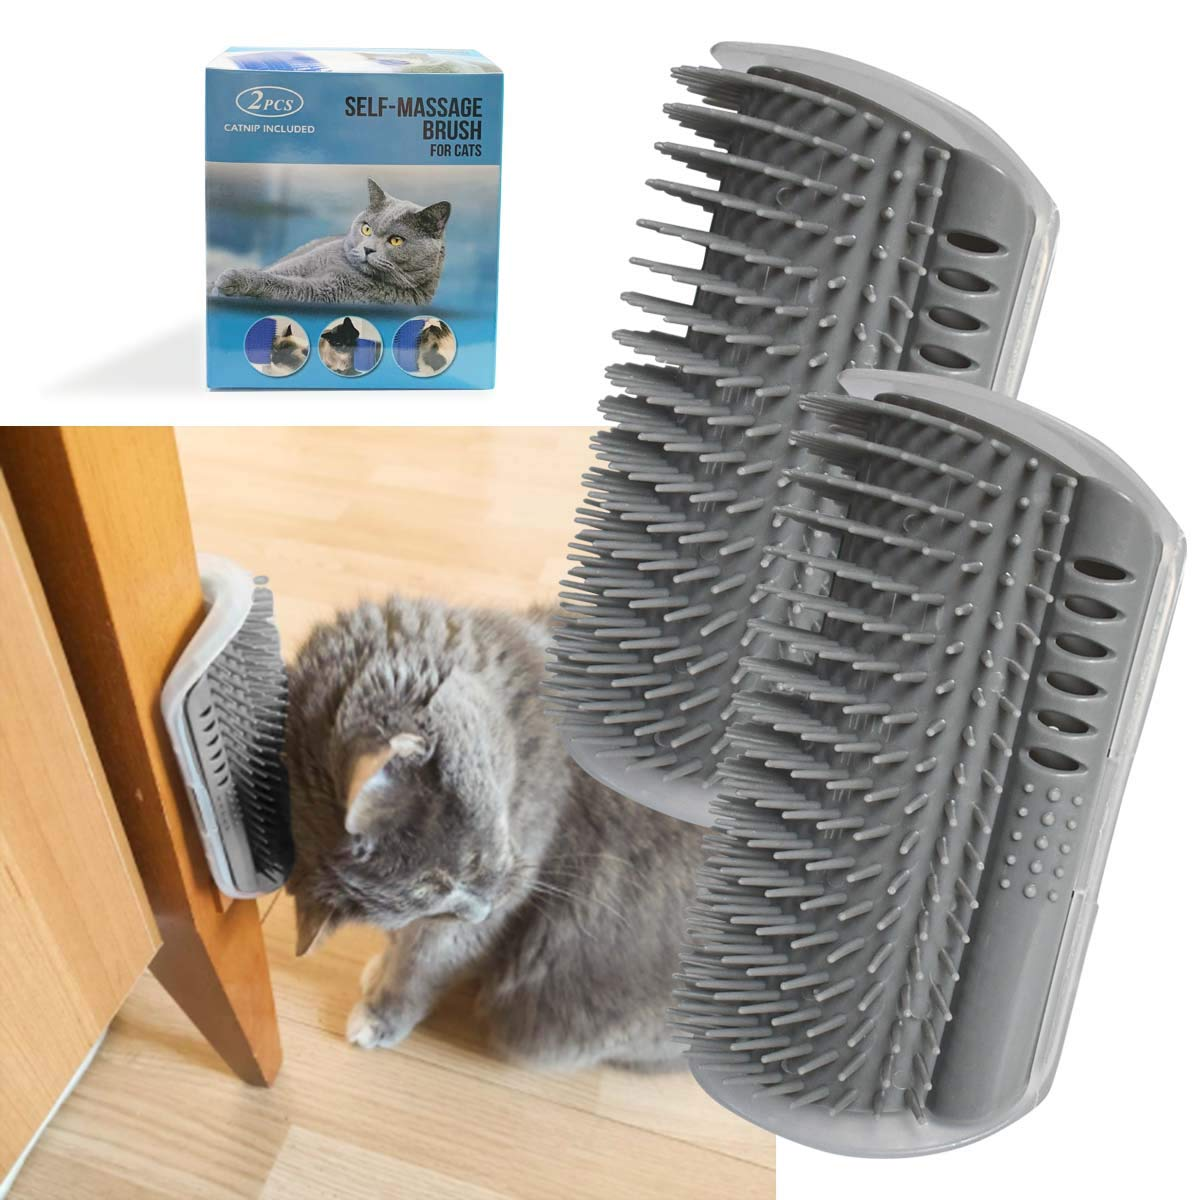 yuntop 2 Pack Softer Cat Corner Self Groomer with Catnip Wall Corner Massage Comb Corner Scratcher Pet Grooming Brush Comb Grooming Wall Brush Self Massage Tool for Long & Short Fur Kitten Cats Dogs